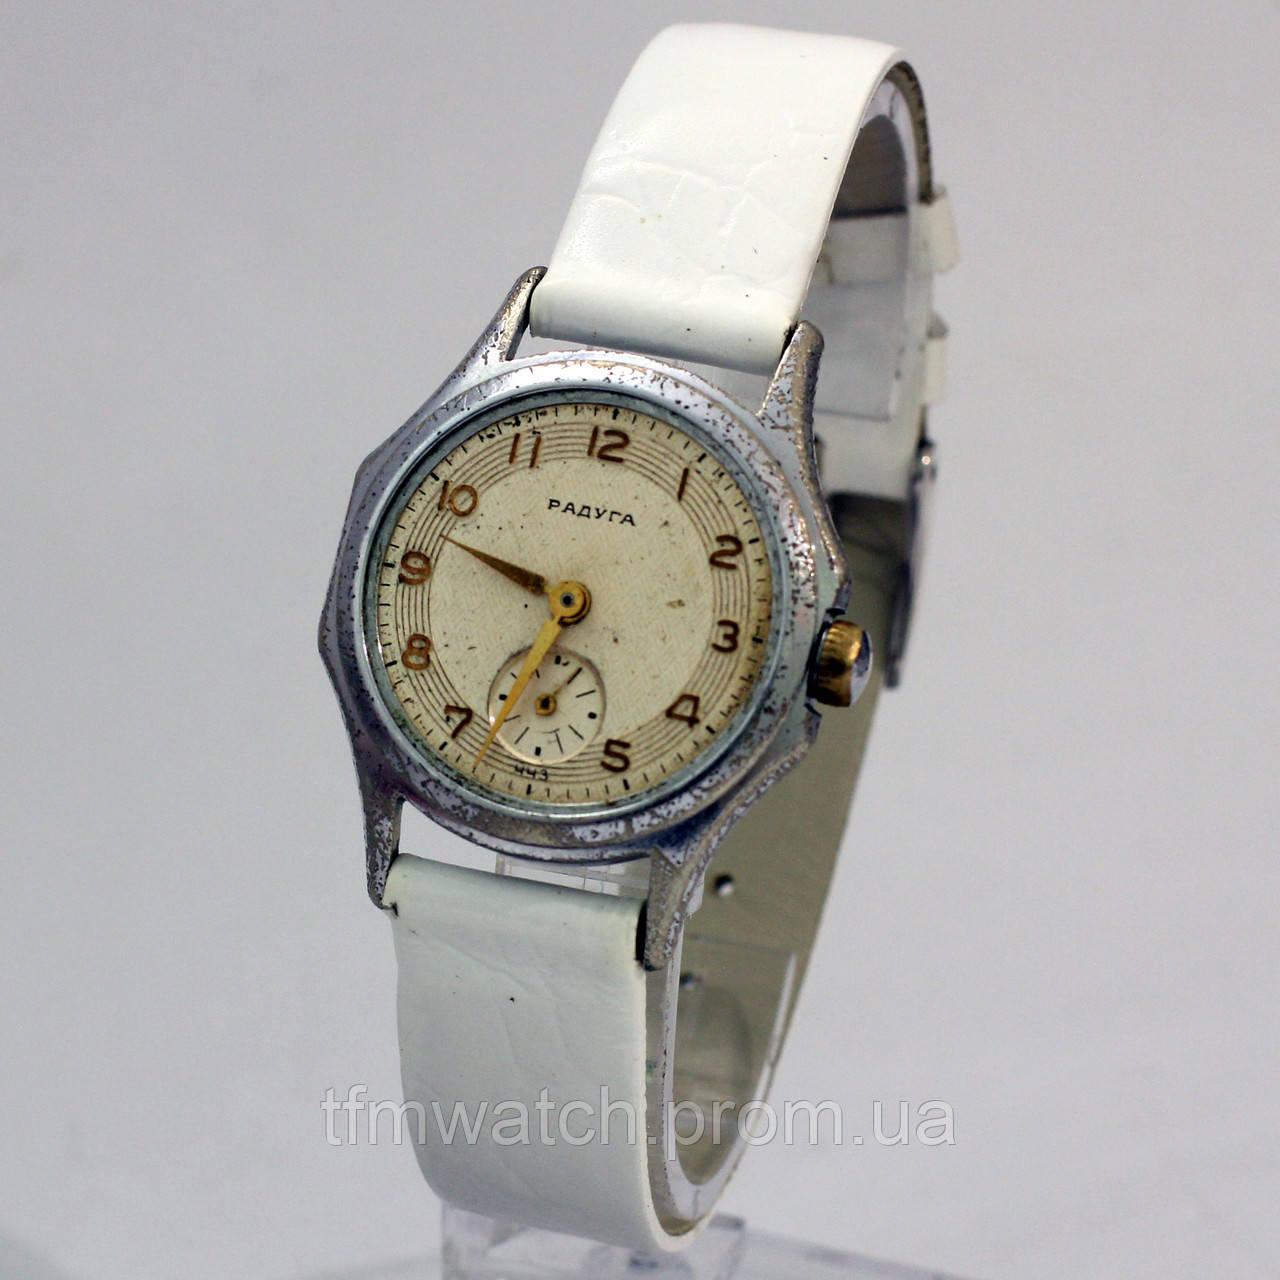 Радуга часы СССР